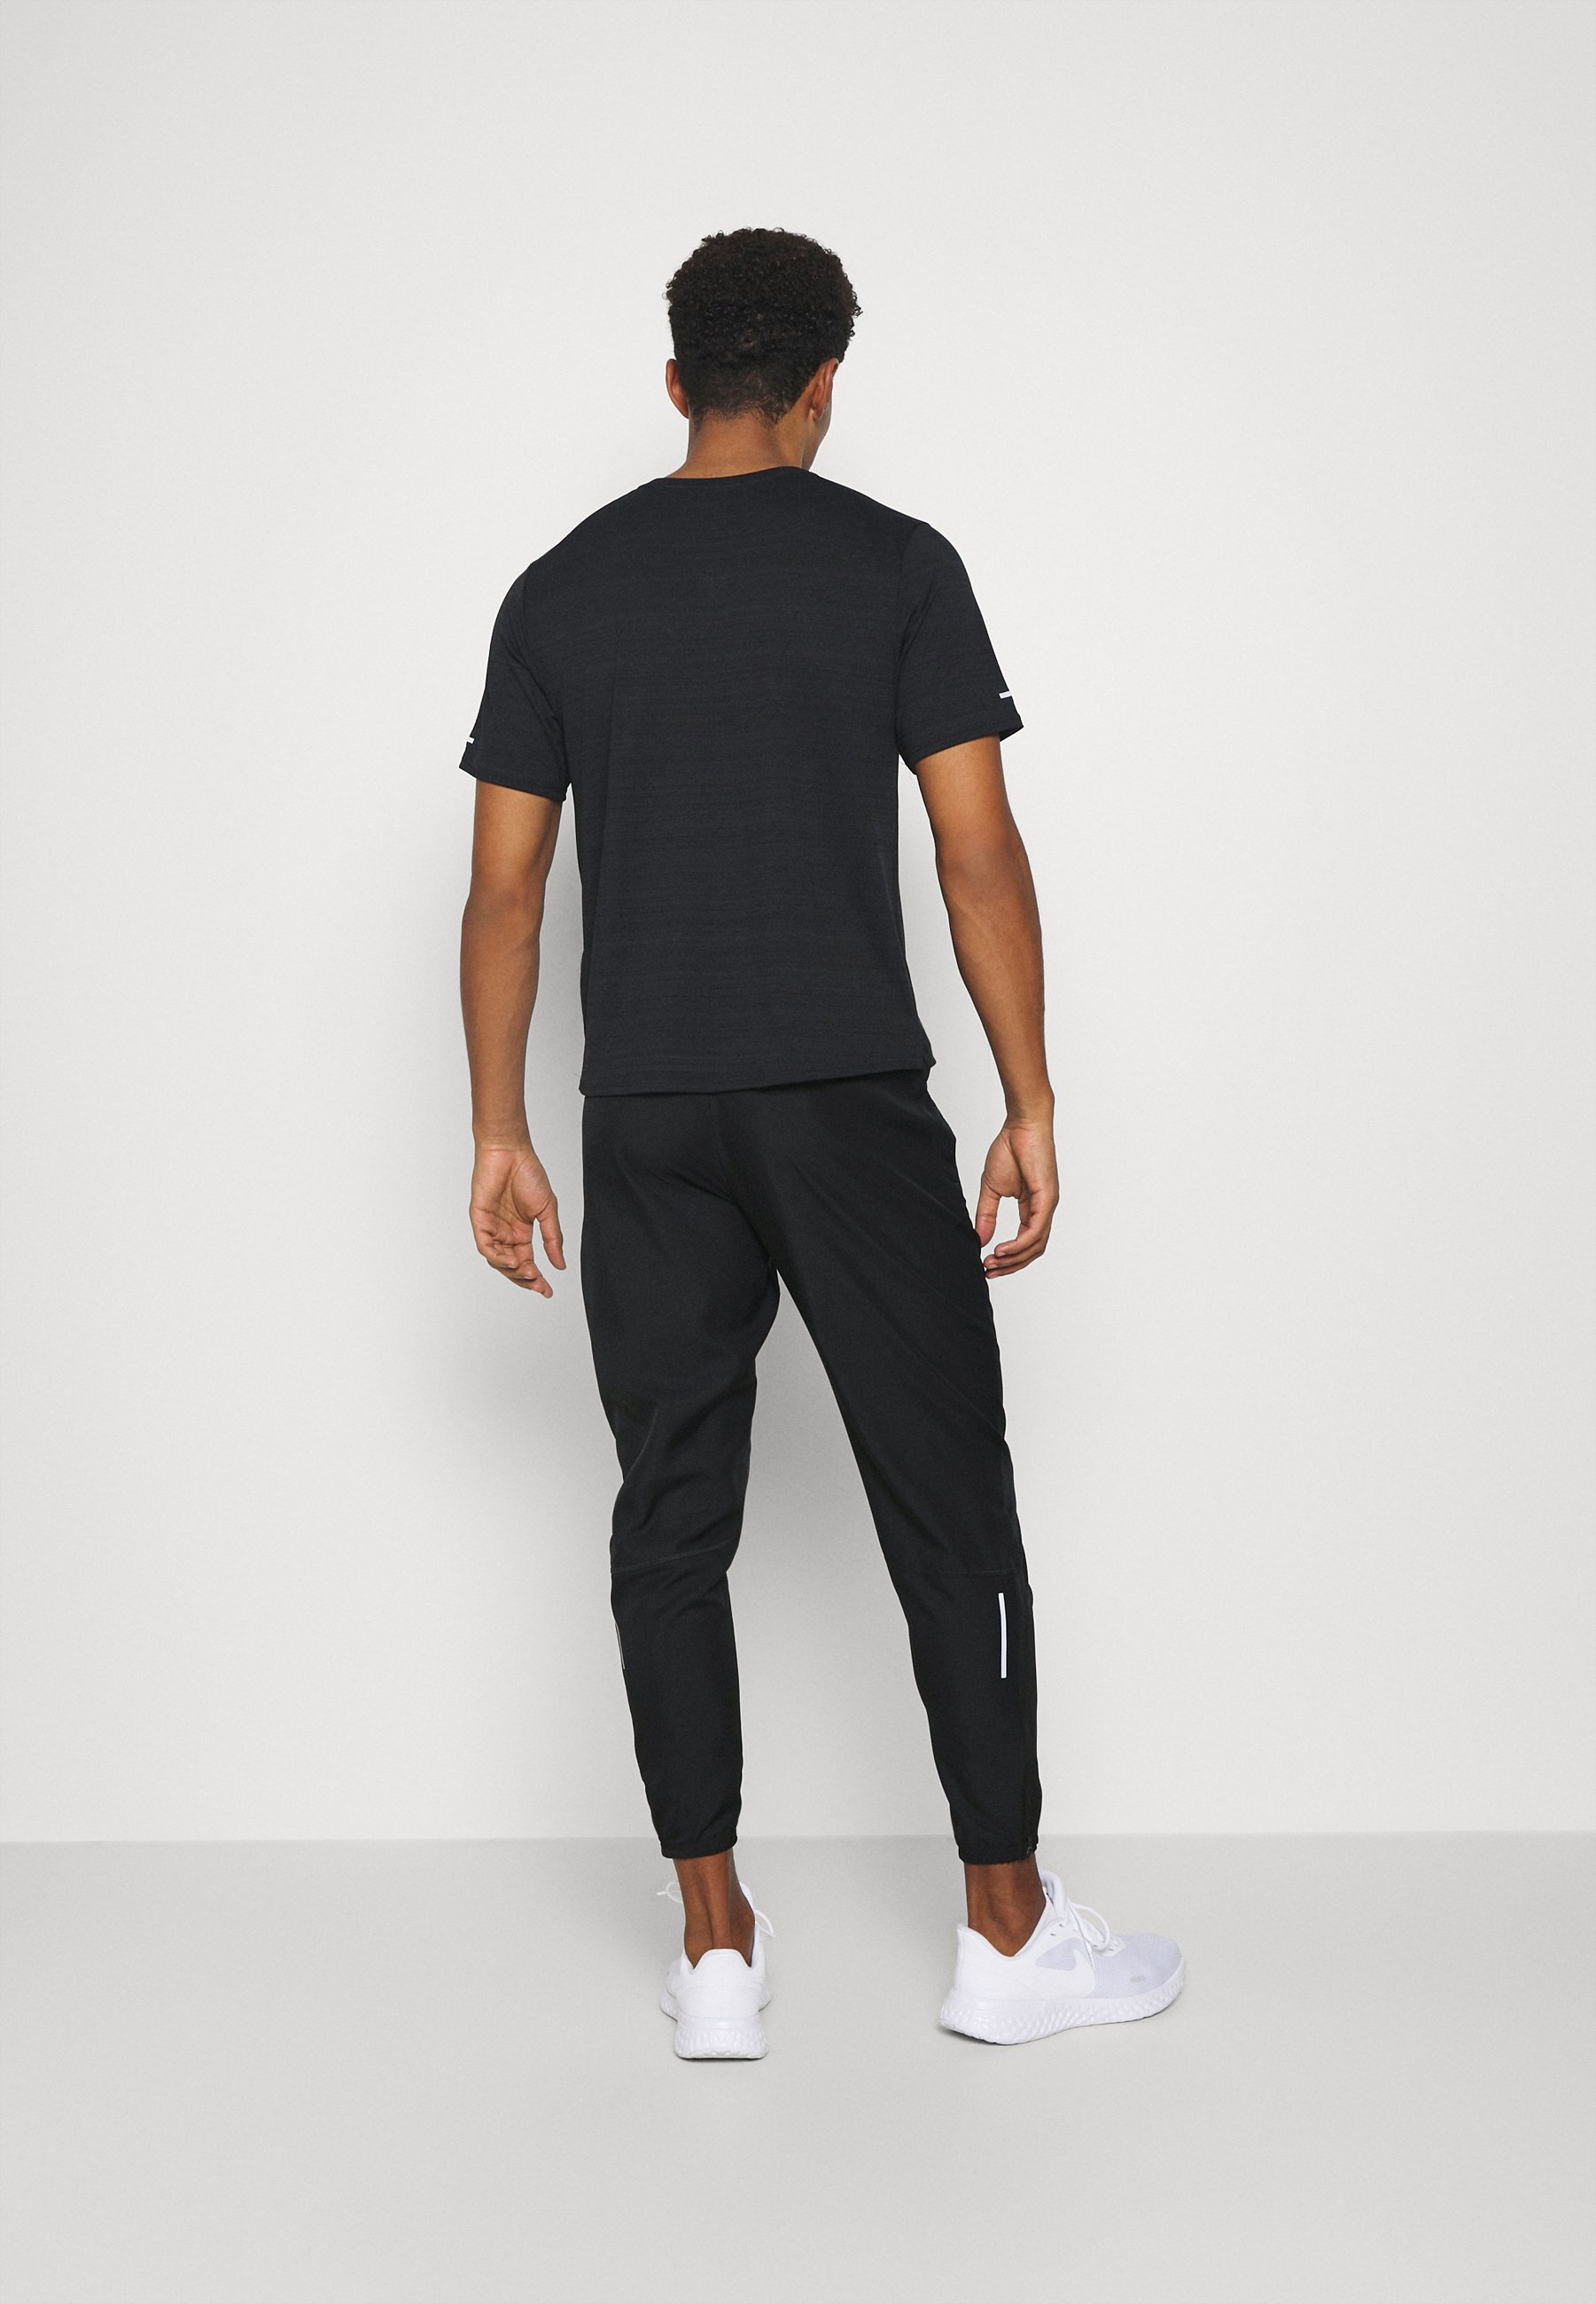 Bon pour rien 8GFN0081 Essential Pantalon de survêtement-Kaki